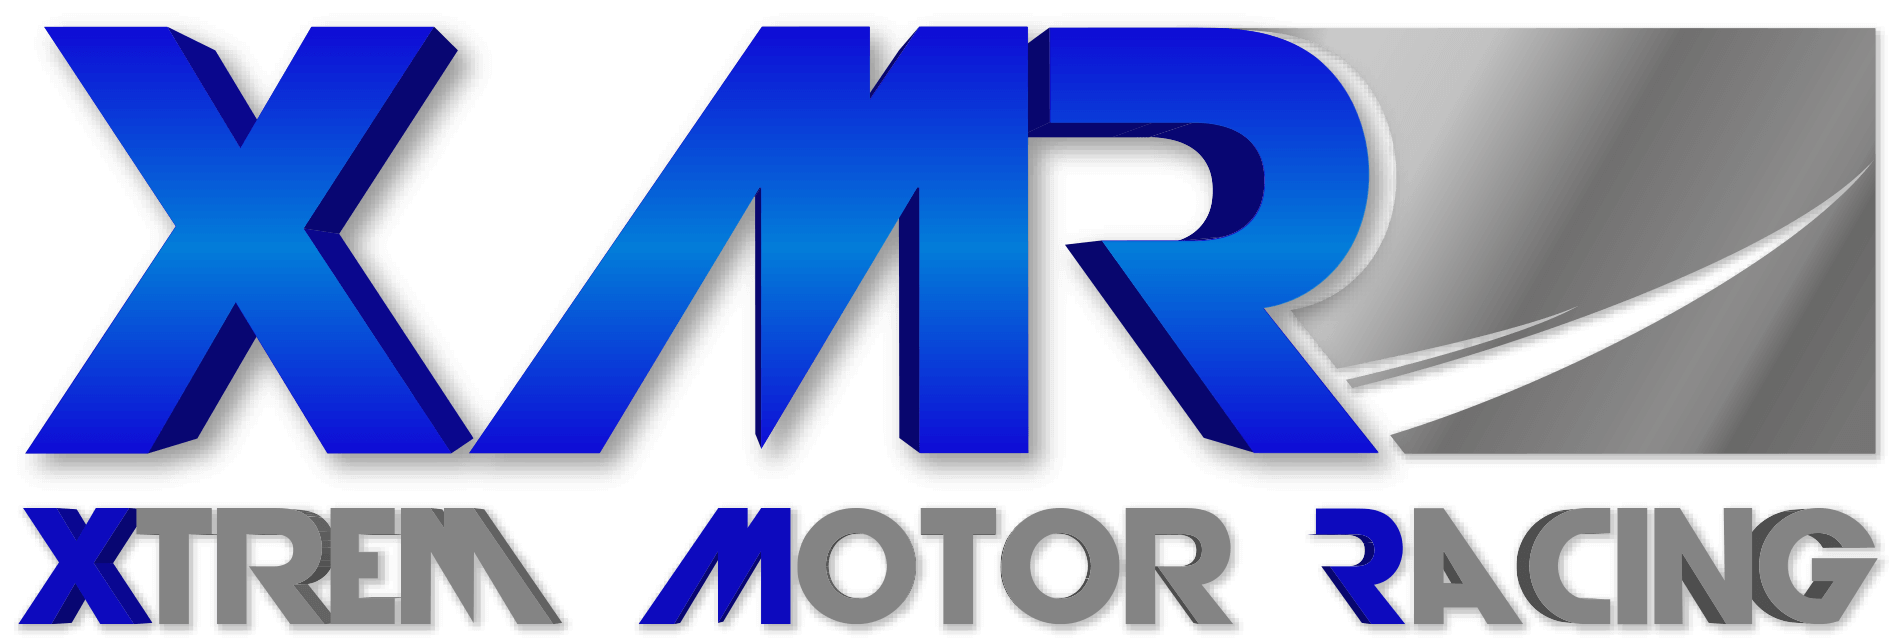 Reprogrammation moteur auto moto Lyon Perpignan